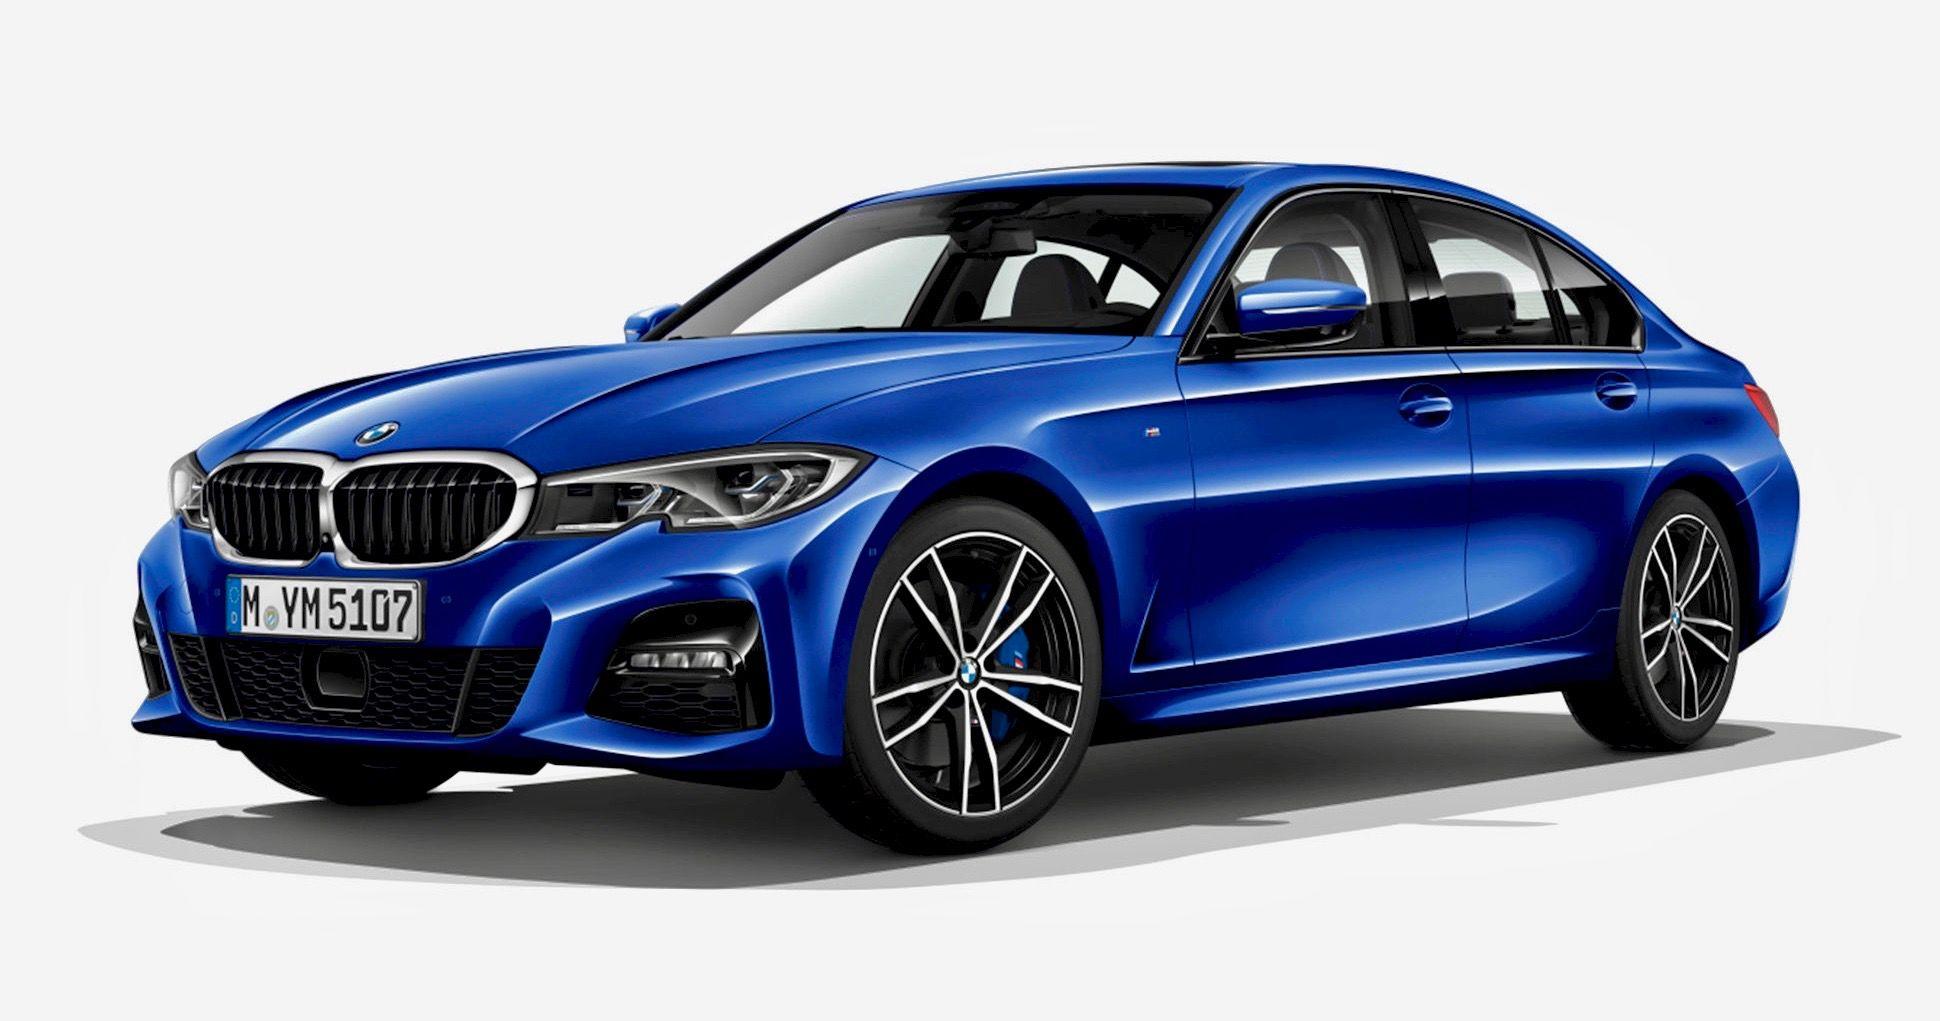 2016 BMW M2 Coupe - Richmonds - Classic and Prestige Cars